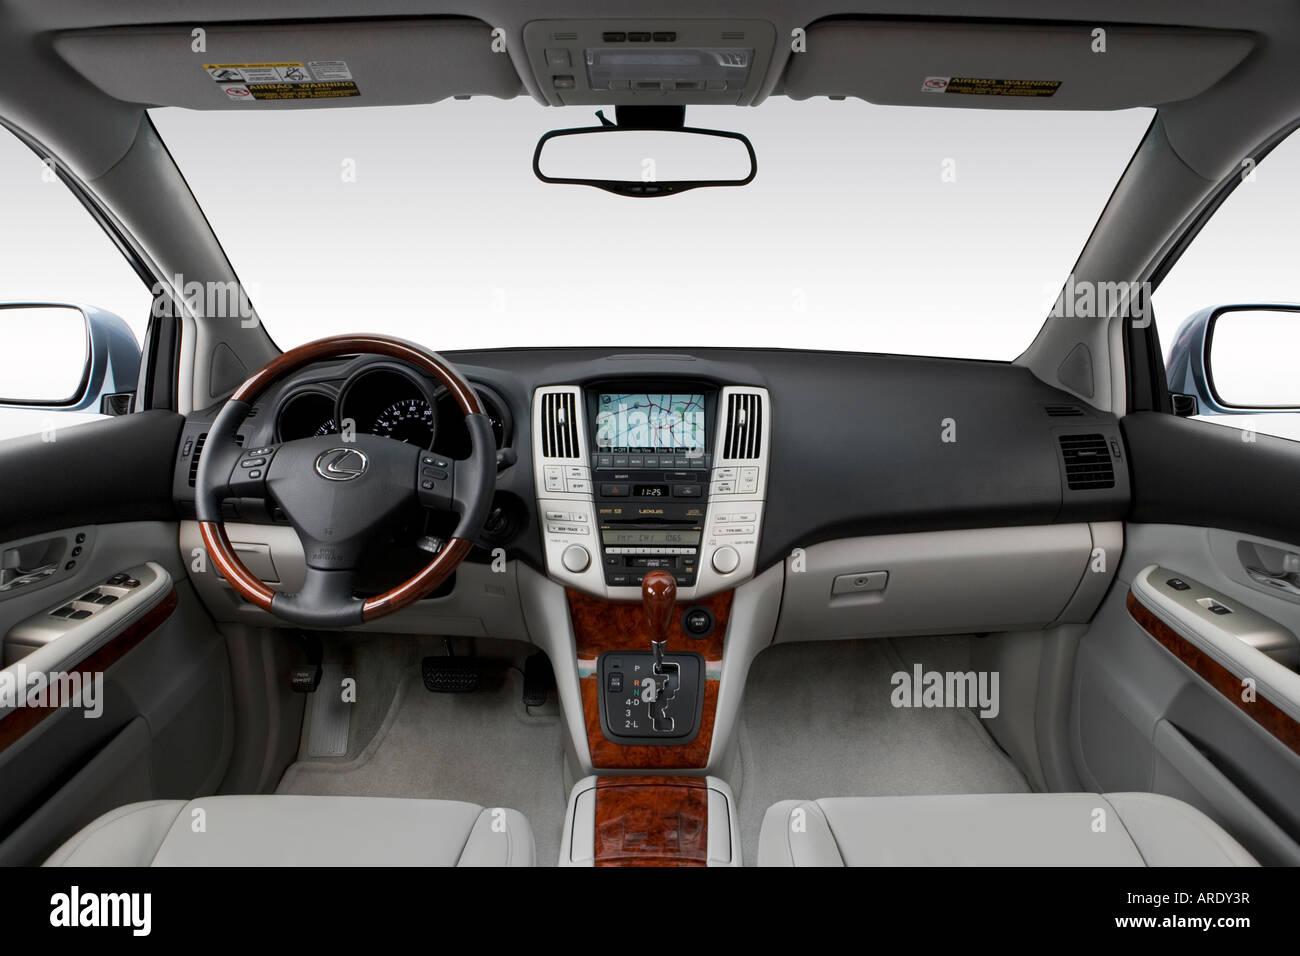 2007 Lexus RX 350 In Blue Dashboard Center Console